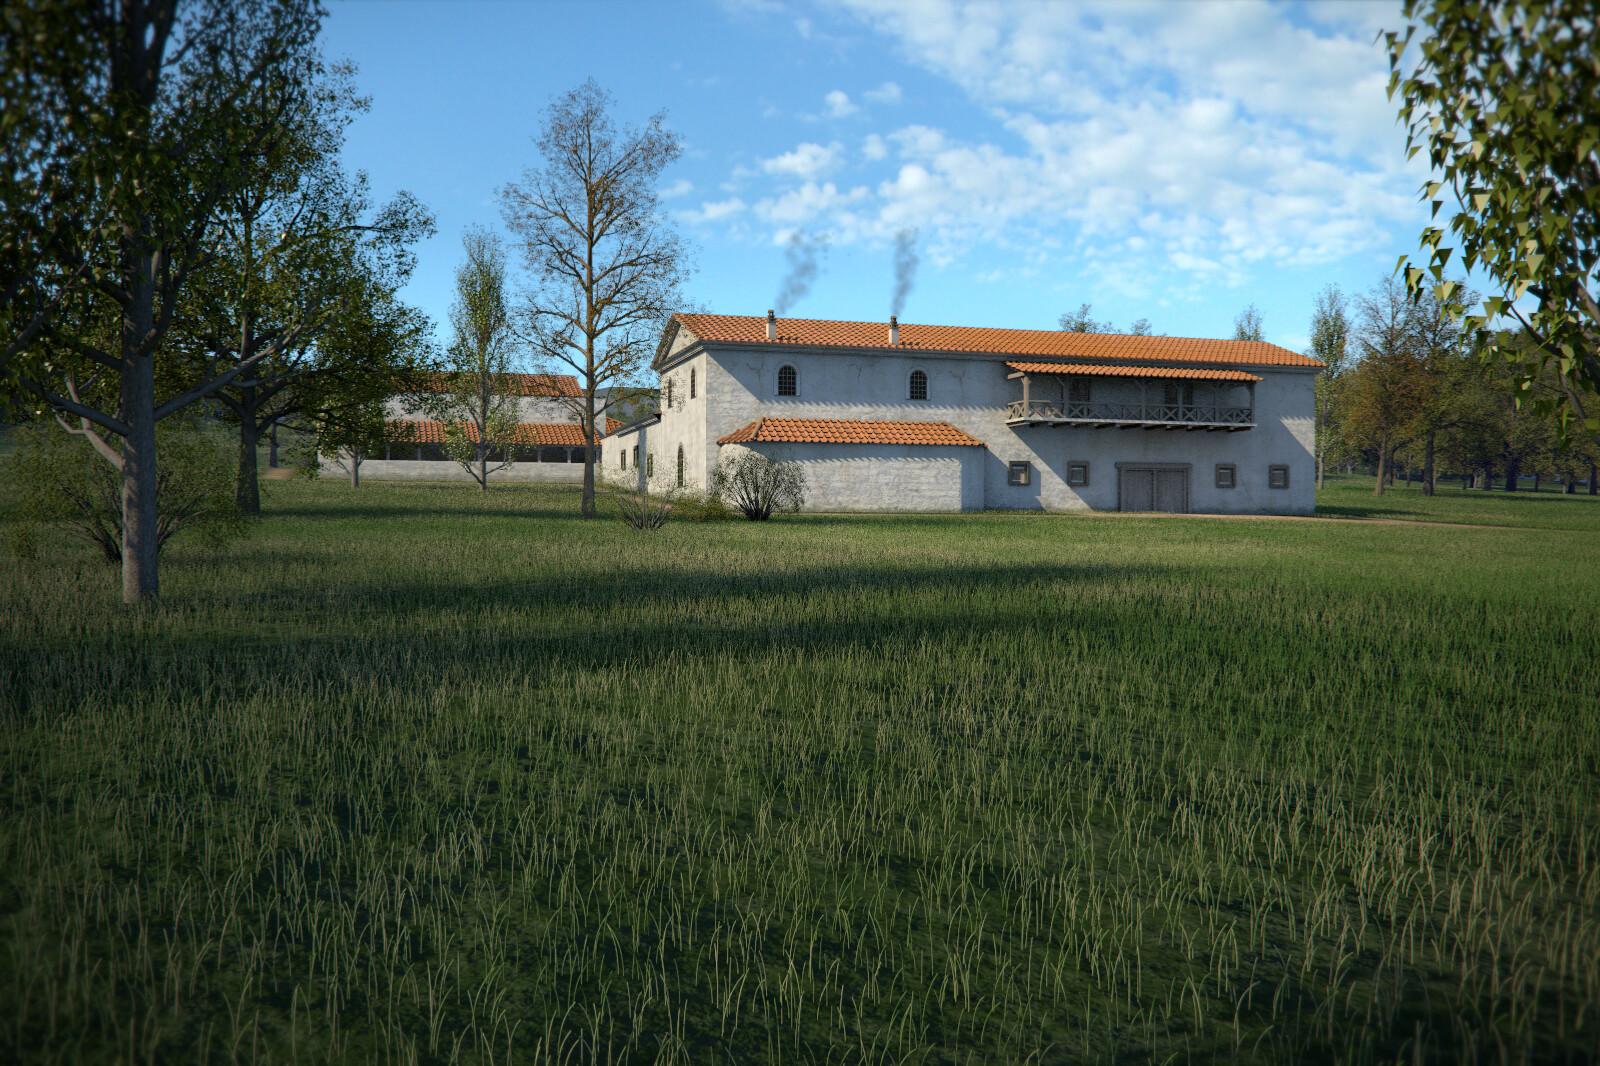 Roman Villa of Weyregg - detail 2